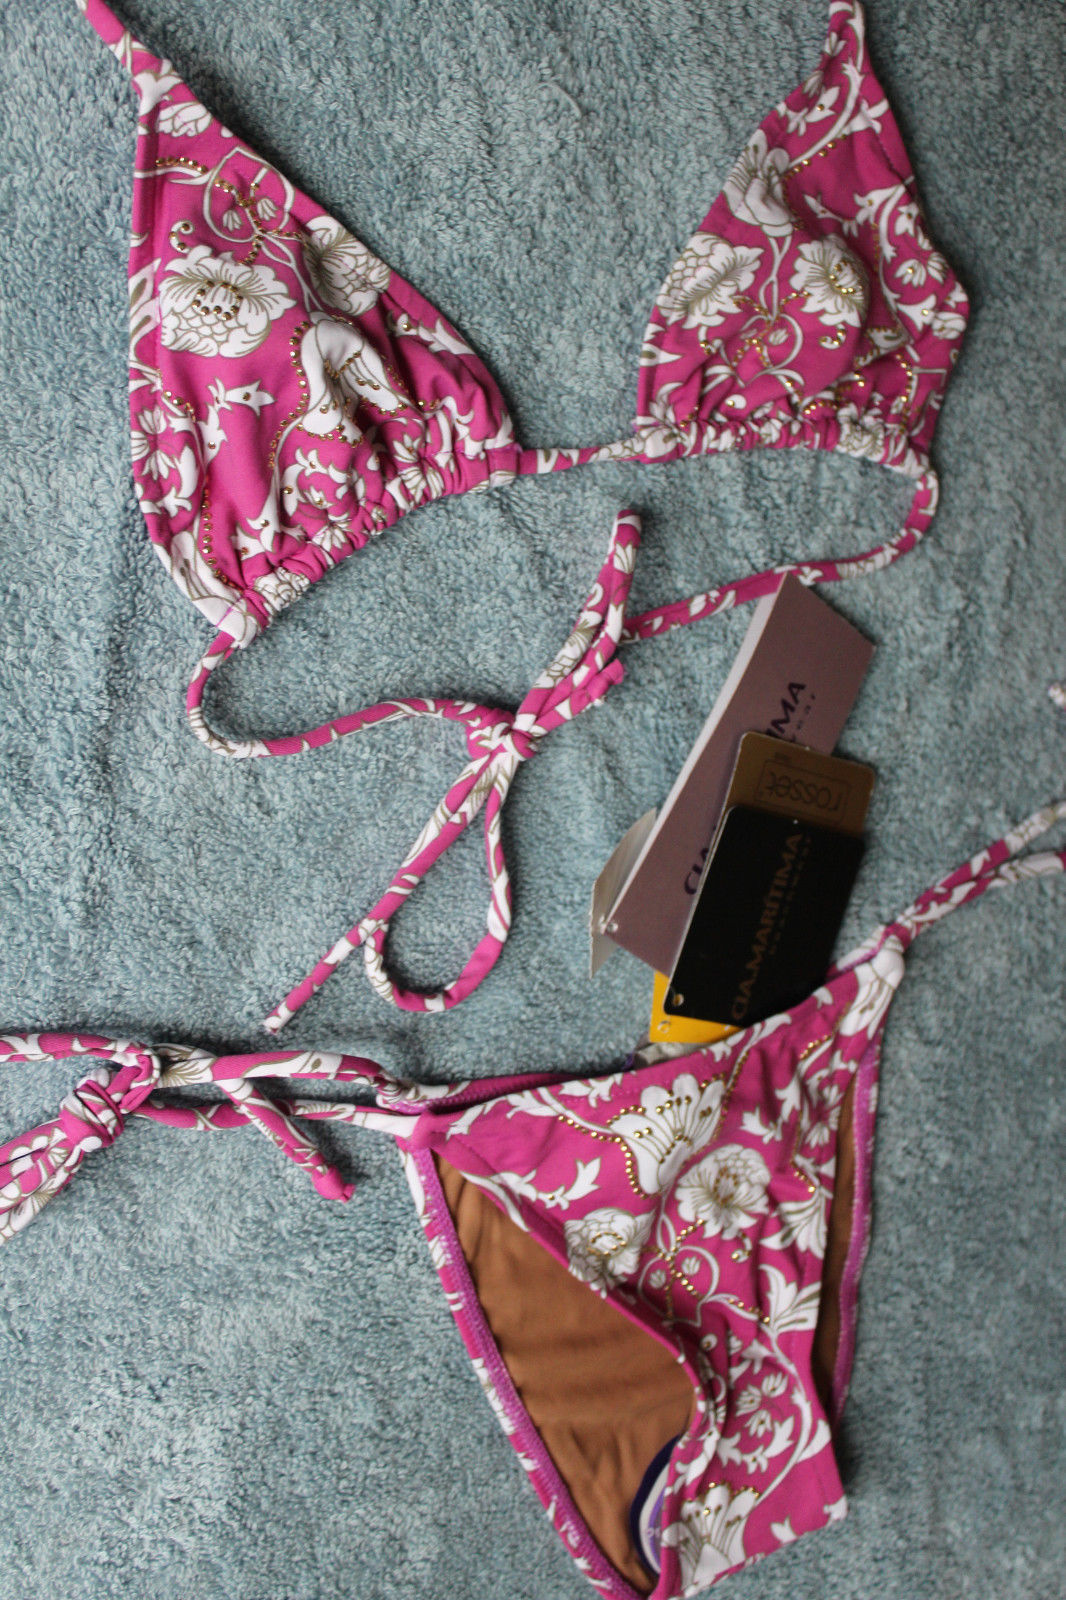 905c3db40d NWT CIA. MARITIMA Brazilian Sexy Rose Pink Triangle Bikini Swim Suit M 40  $180